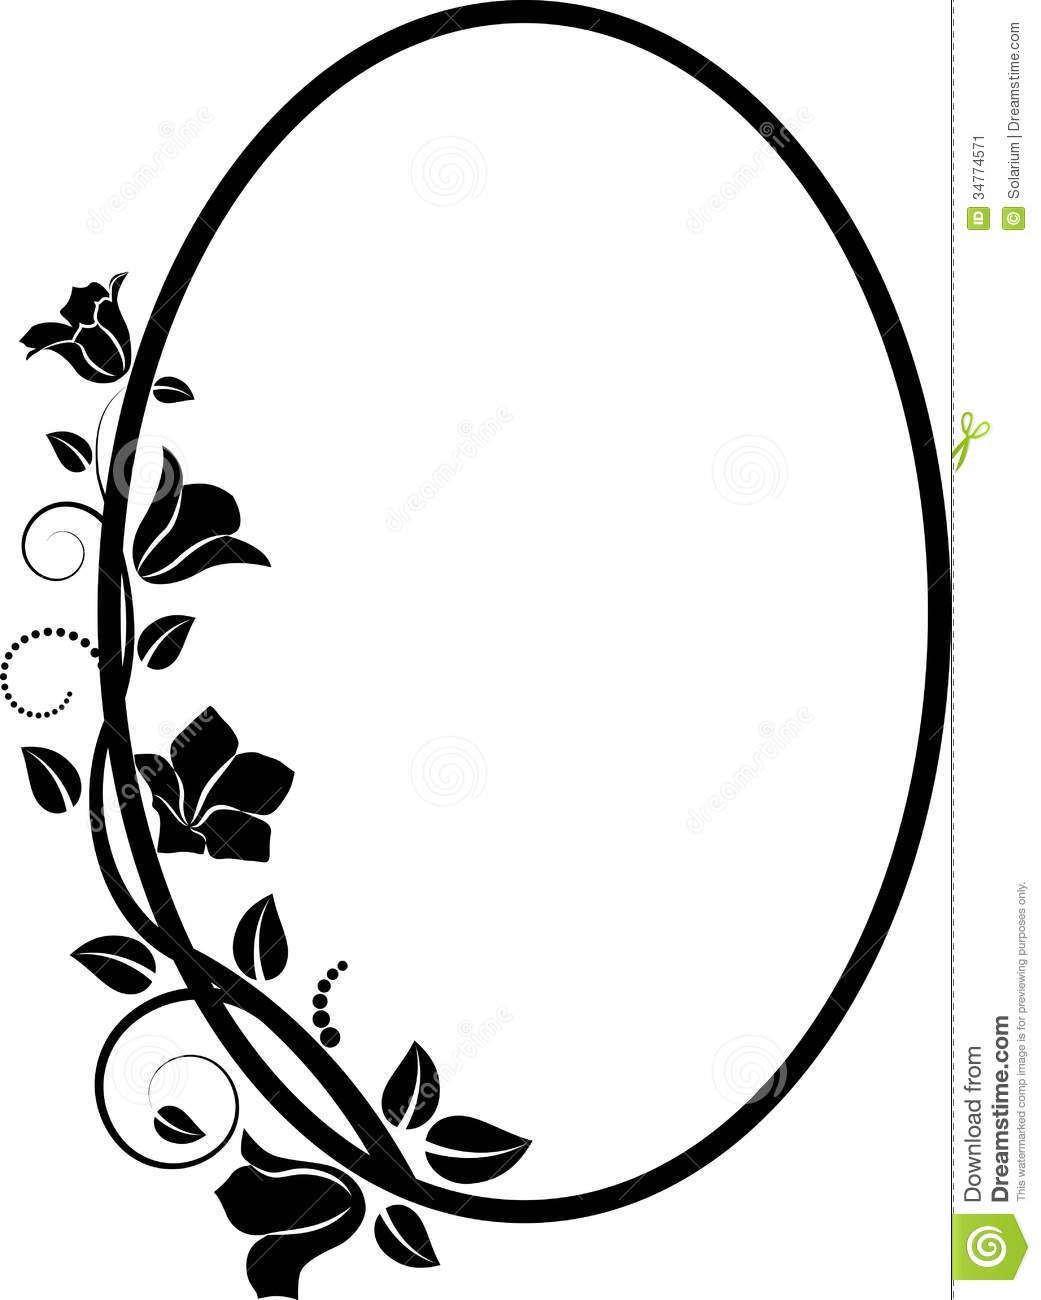 Rose oval frame clipart black and white banner free download Frame Clipart Black And White | Free download best Frame ... banner free download